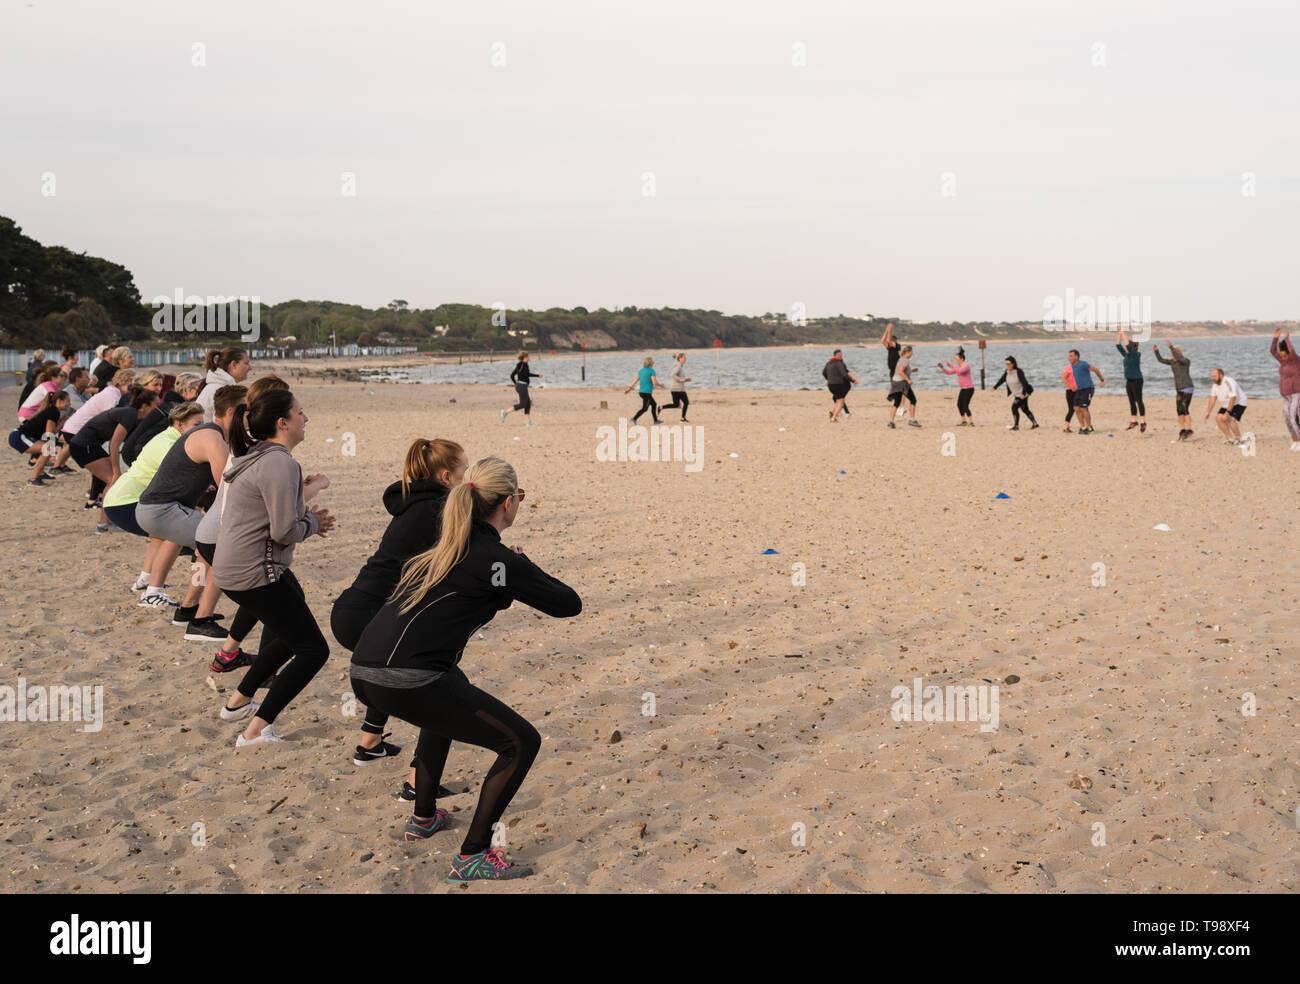 Group exercise on the beach at Avon Beach near Mudeford - Stock Image